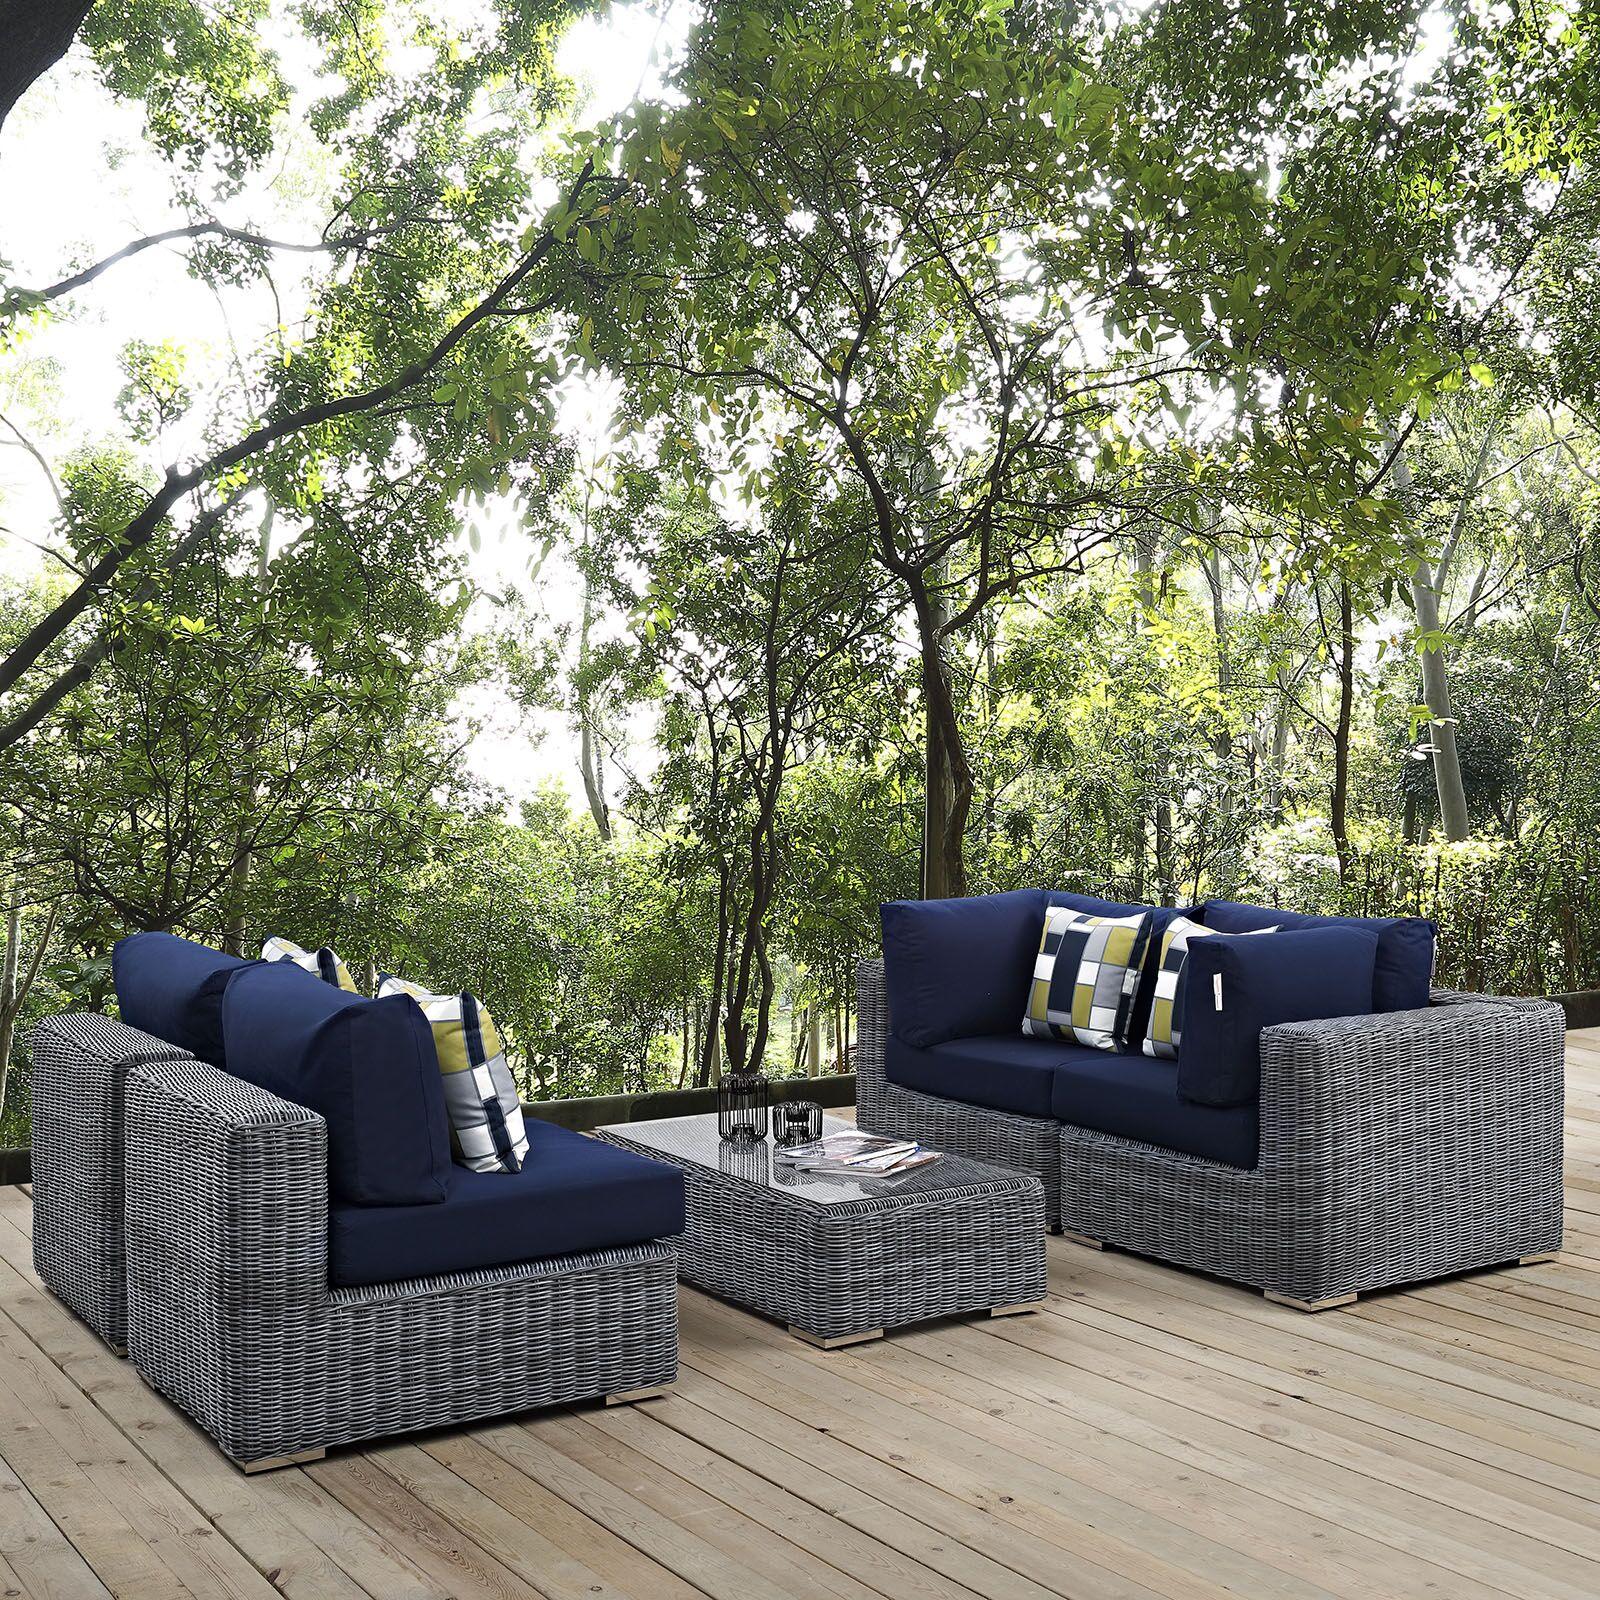 Keiran 5 Piece Rattan Sunbrella Sectional Set with Cushions Fabric: Navy